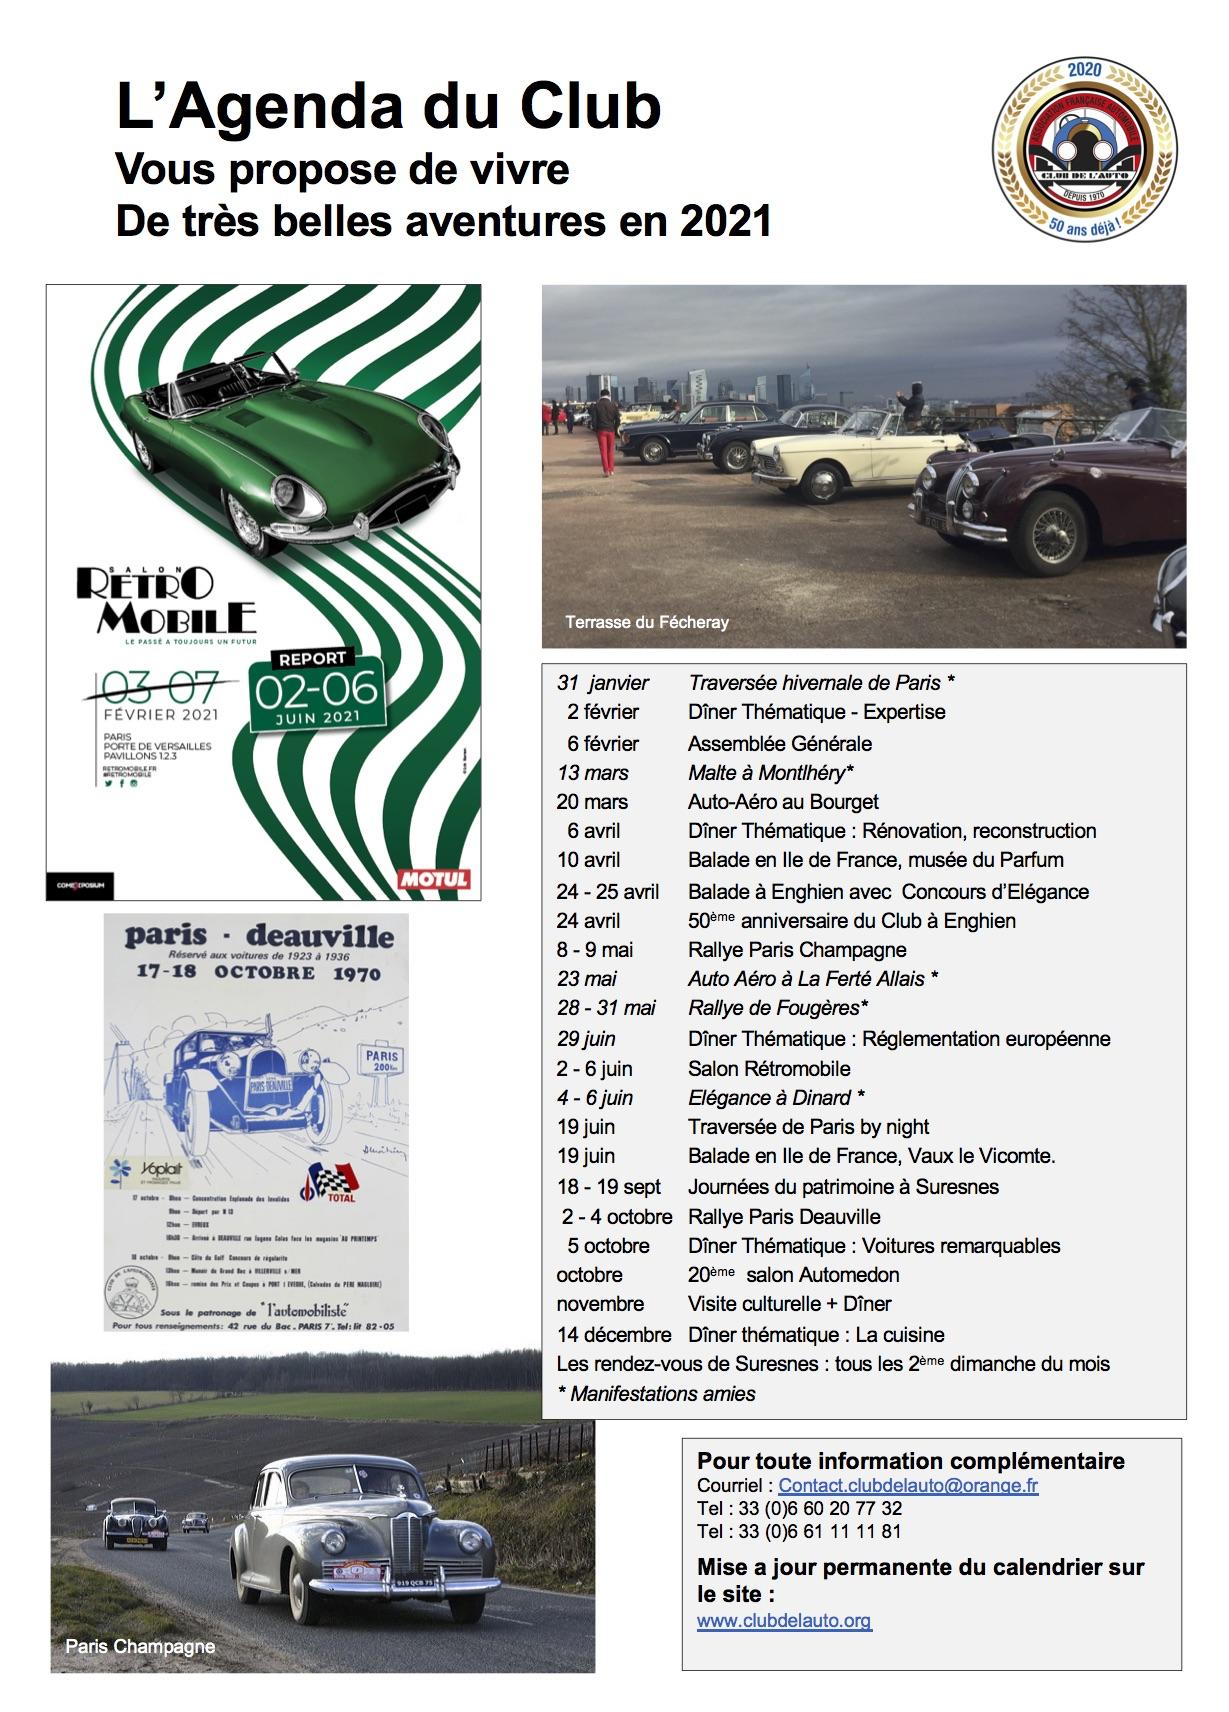 Agenda du club de l'auto 2021